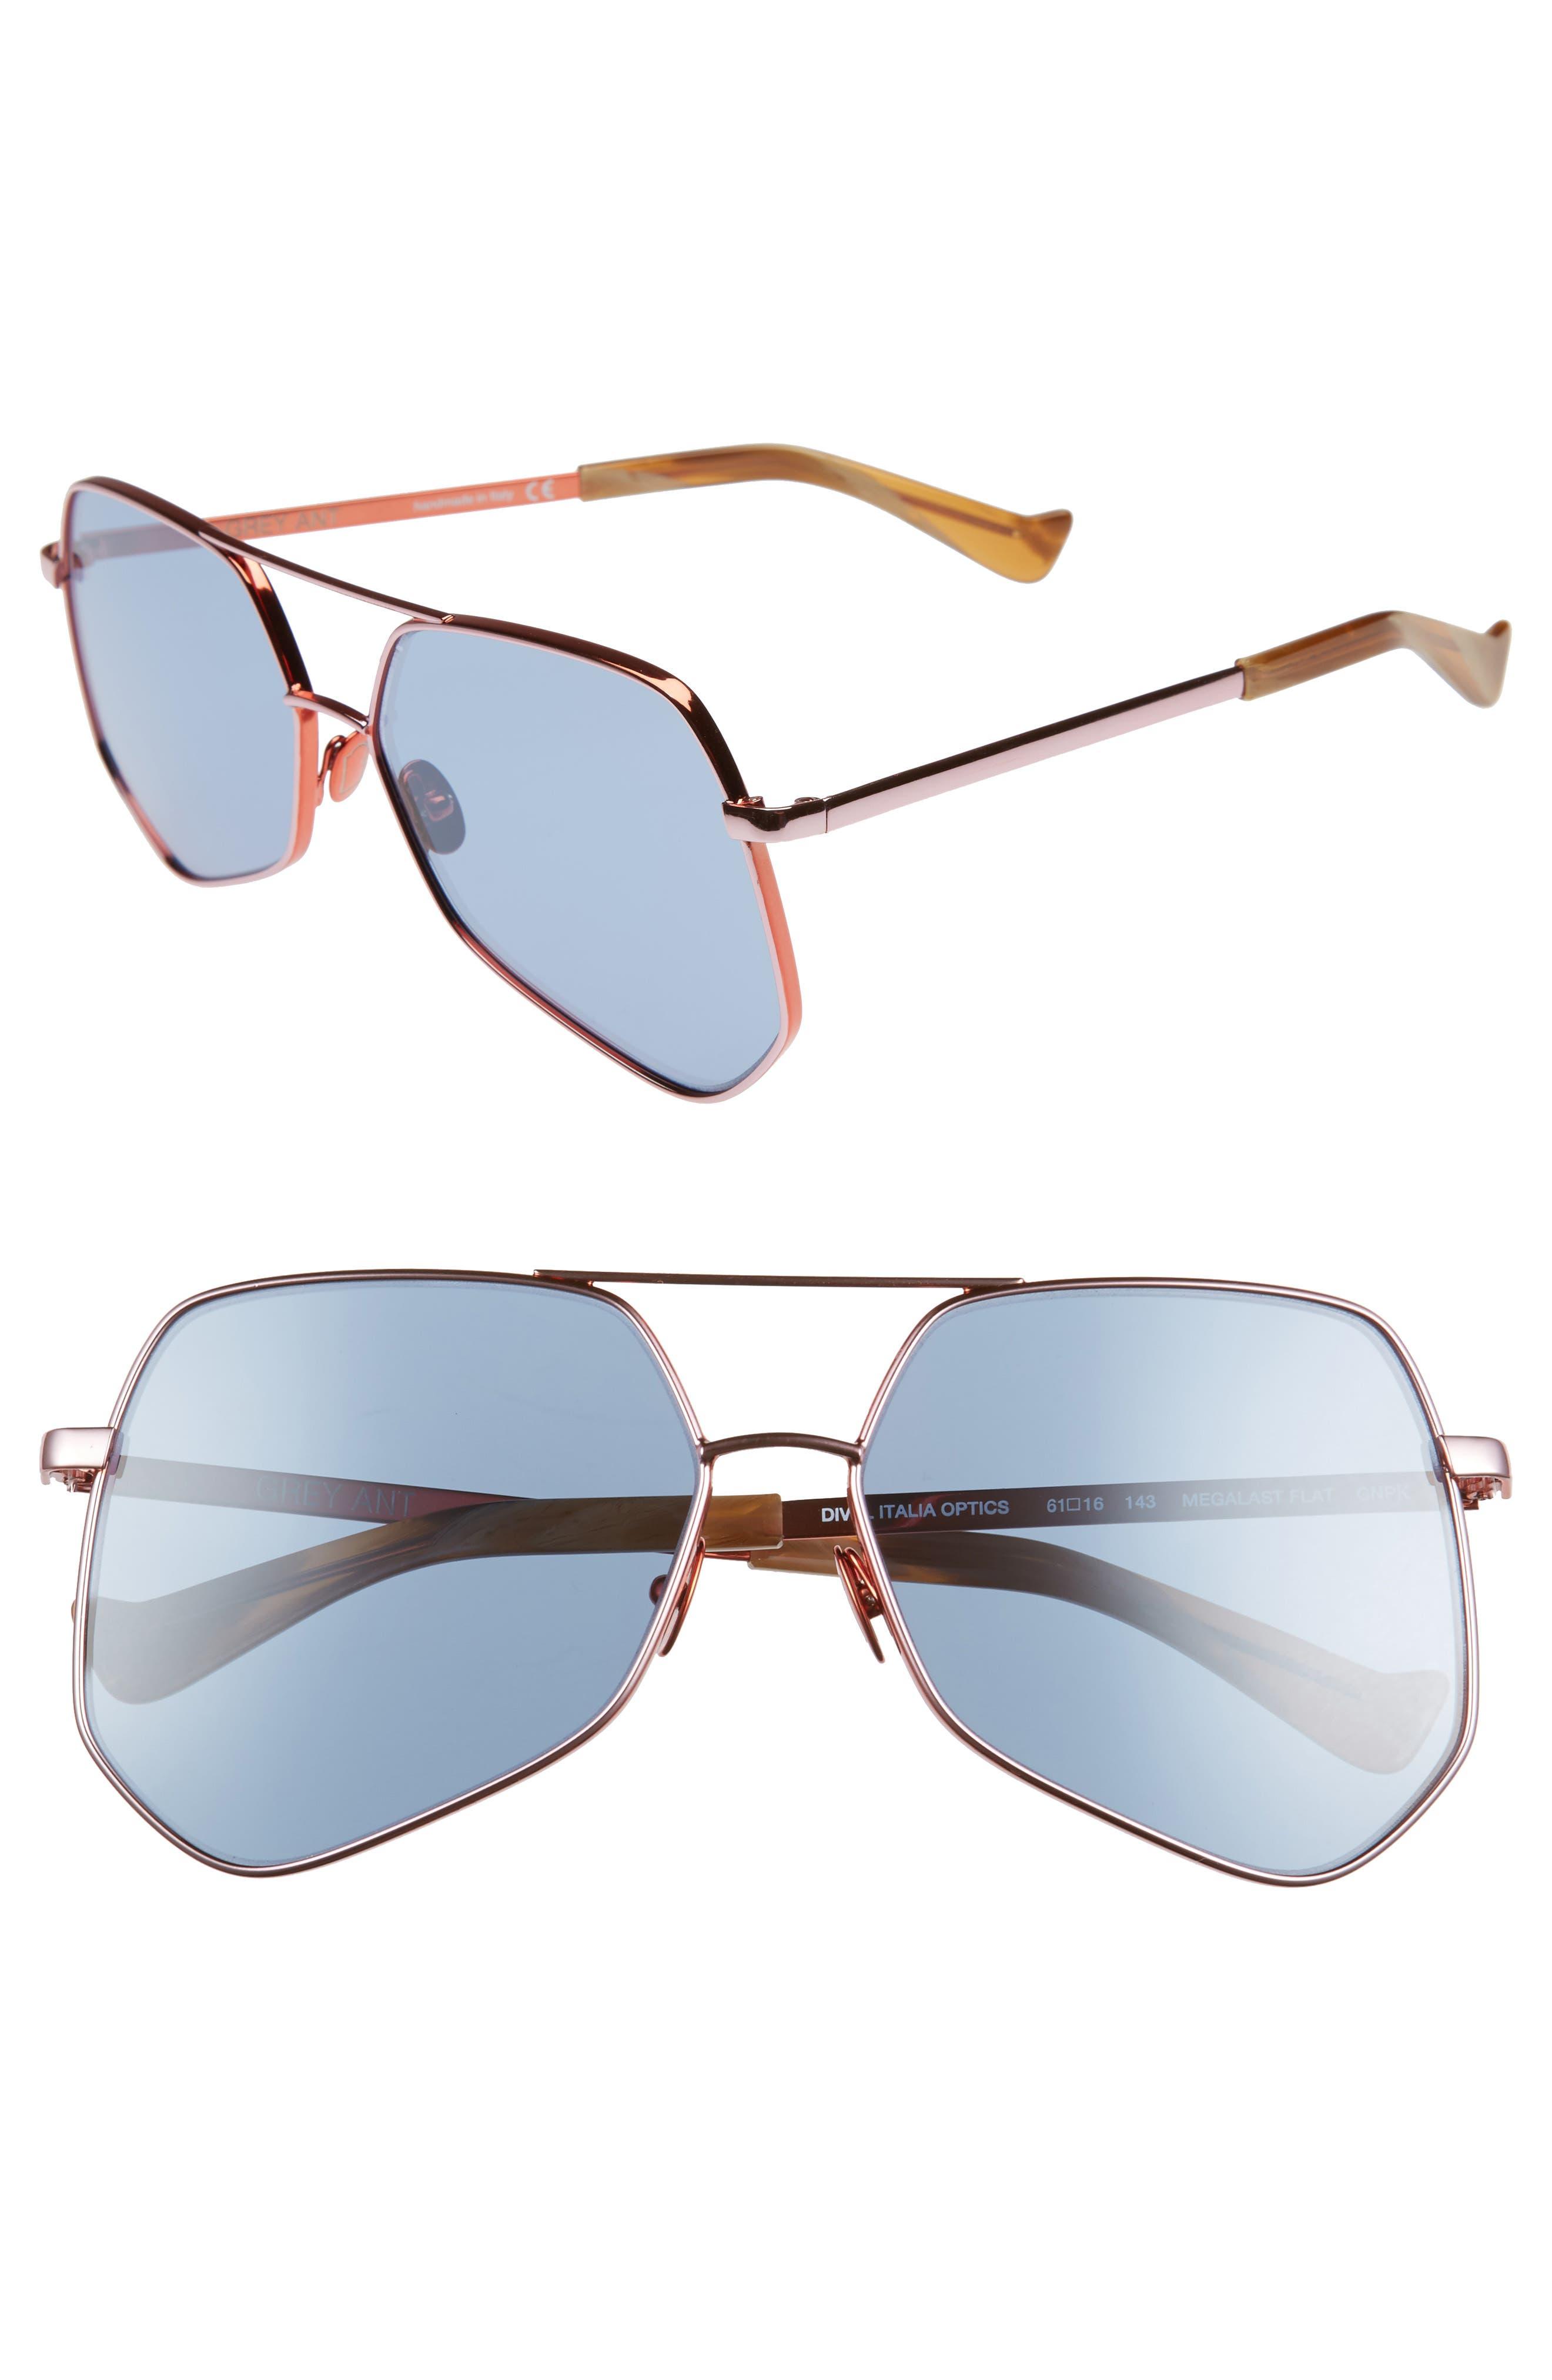 Megalast Flat 61mm Sunglasses,                         Main,                         color, Copper Pink / Light Blue